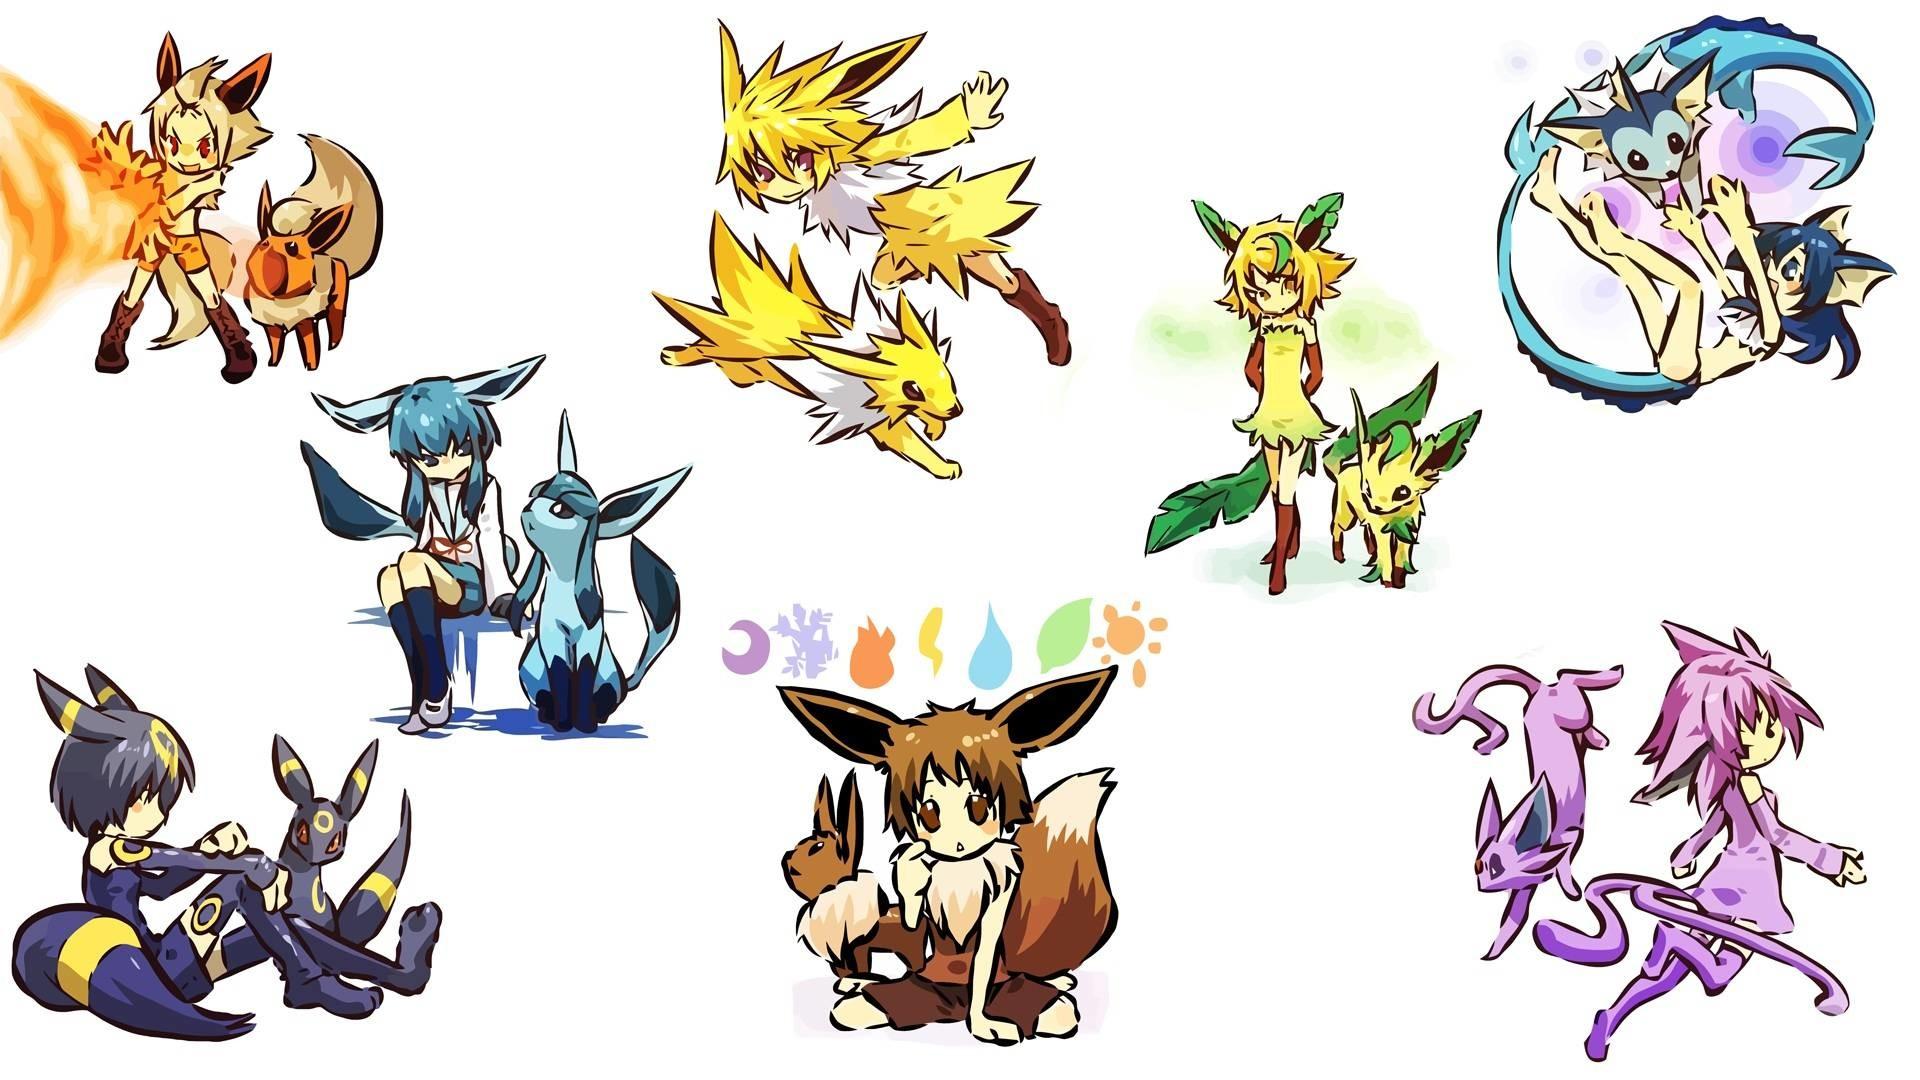 26919-pokemon-time-to-watch-pokemon.jpg